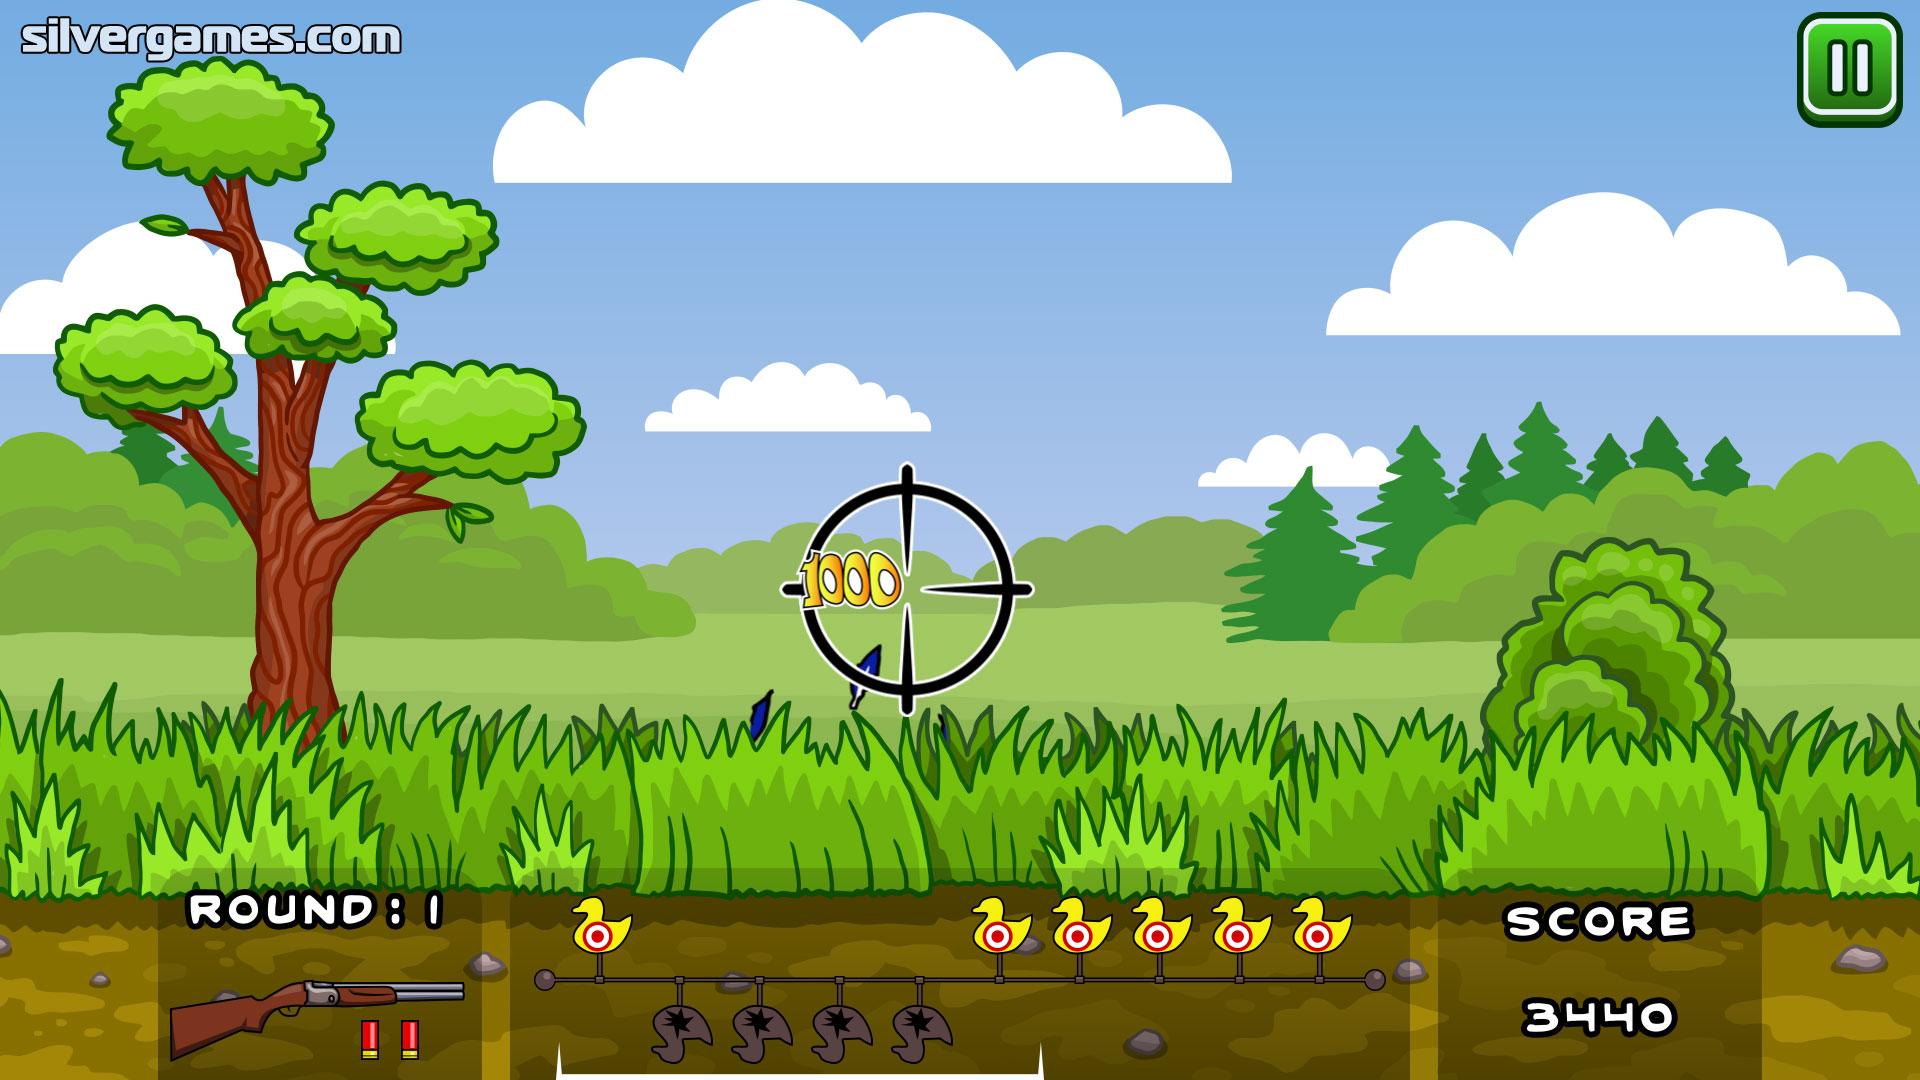 duck shooter online merkur automaten online spielen novoline